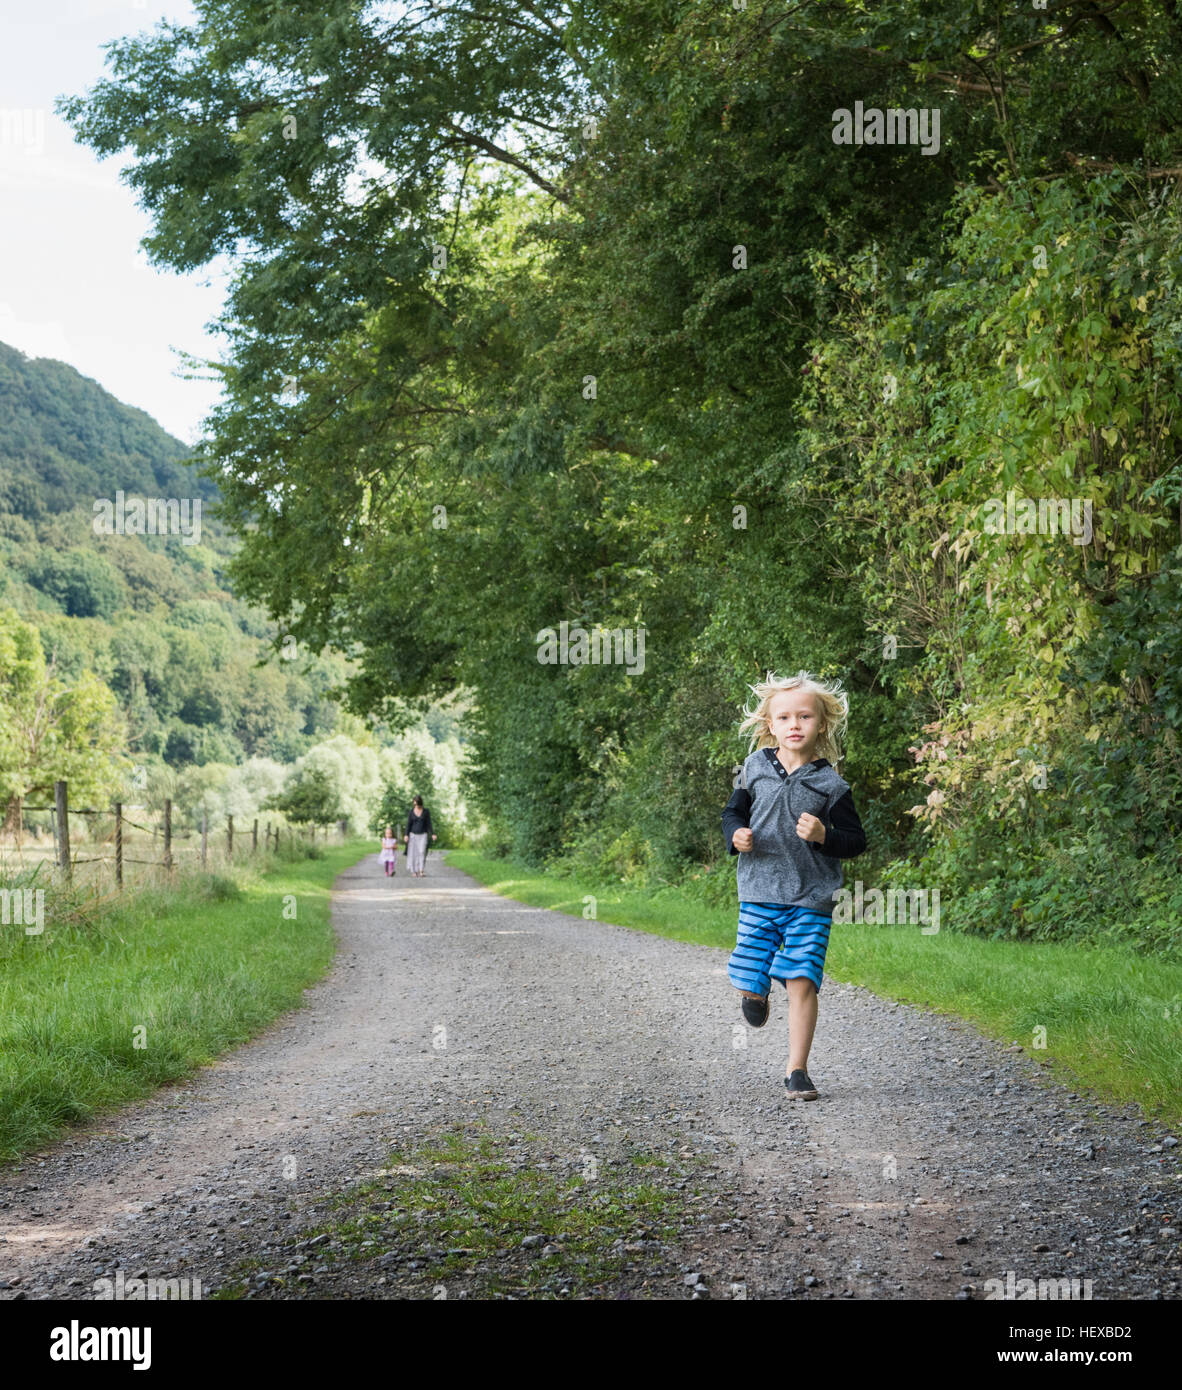 Boy with family running on rural road, Porta Westfalica, North Rhine Westphalia, Germany Stock Photo